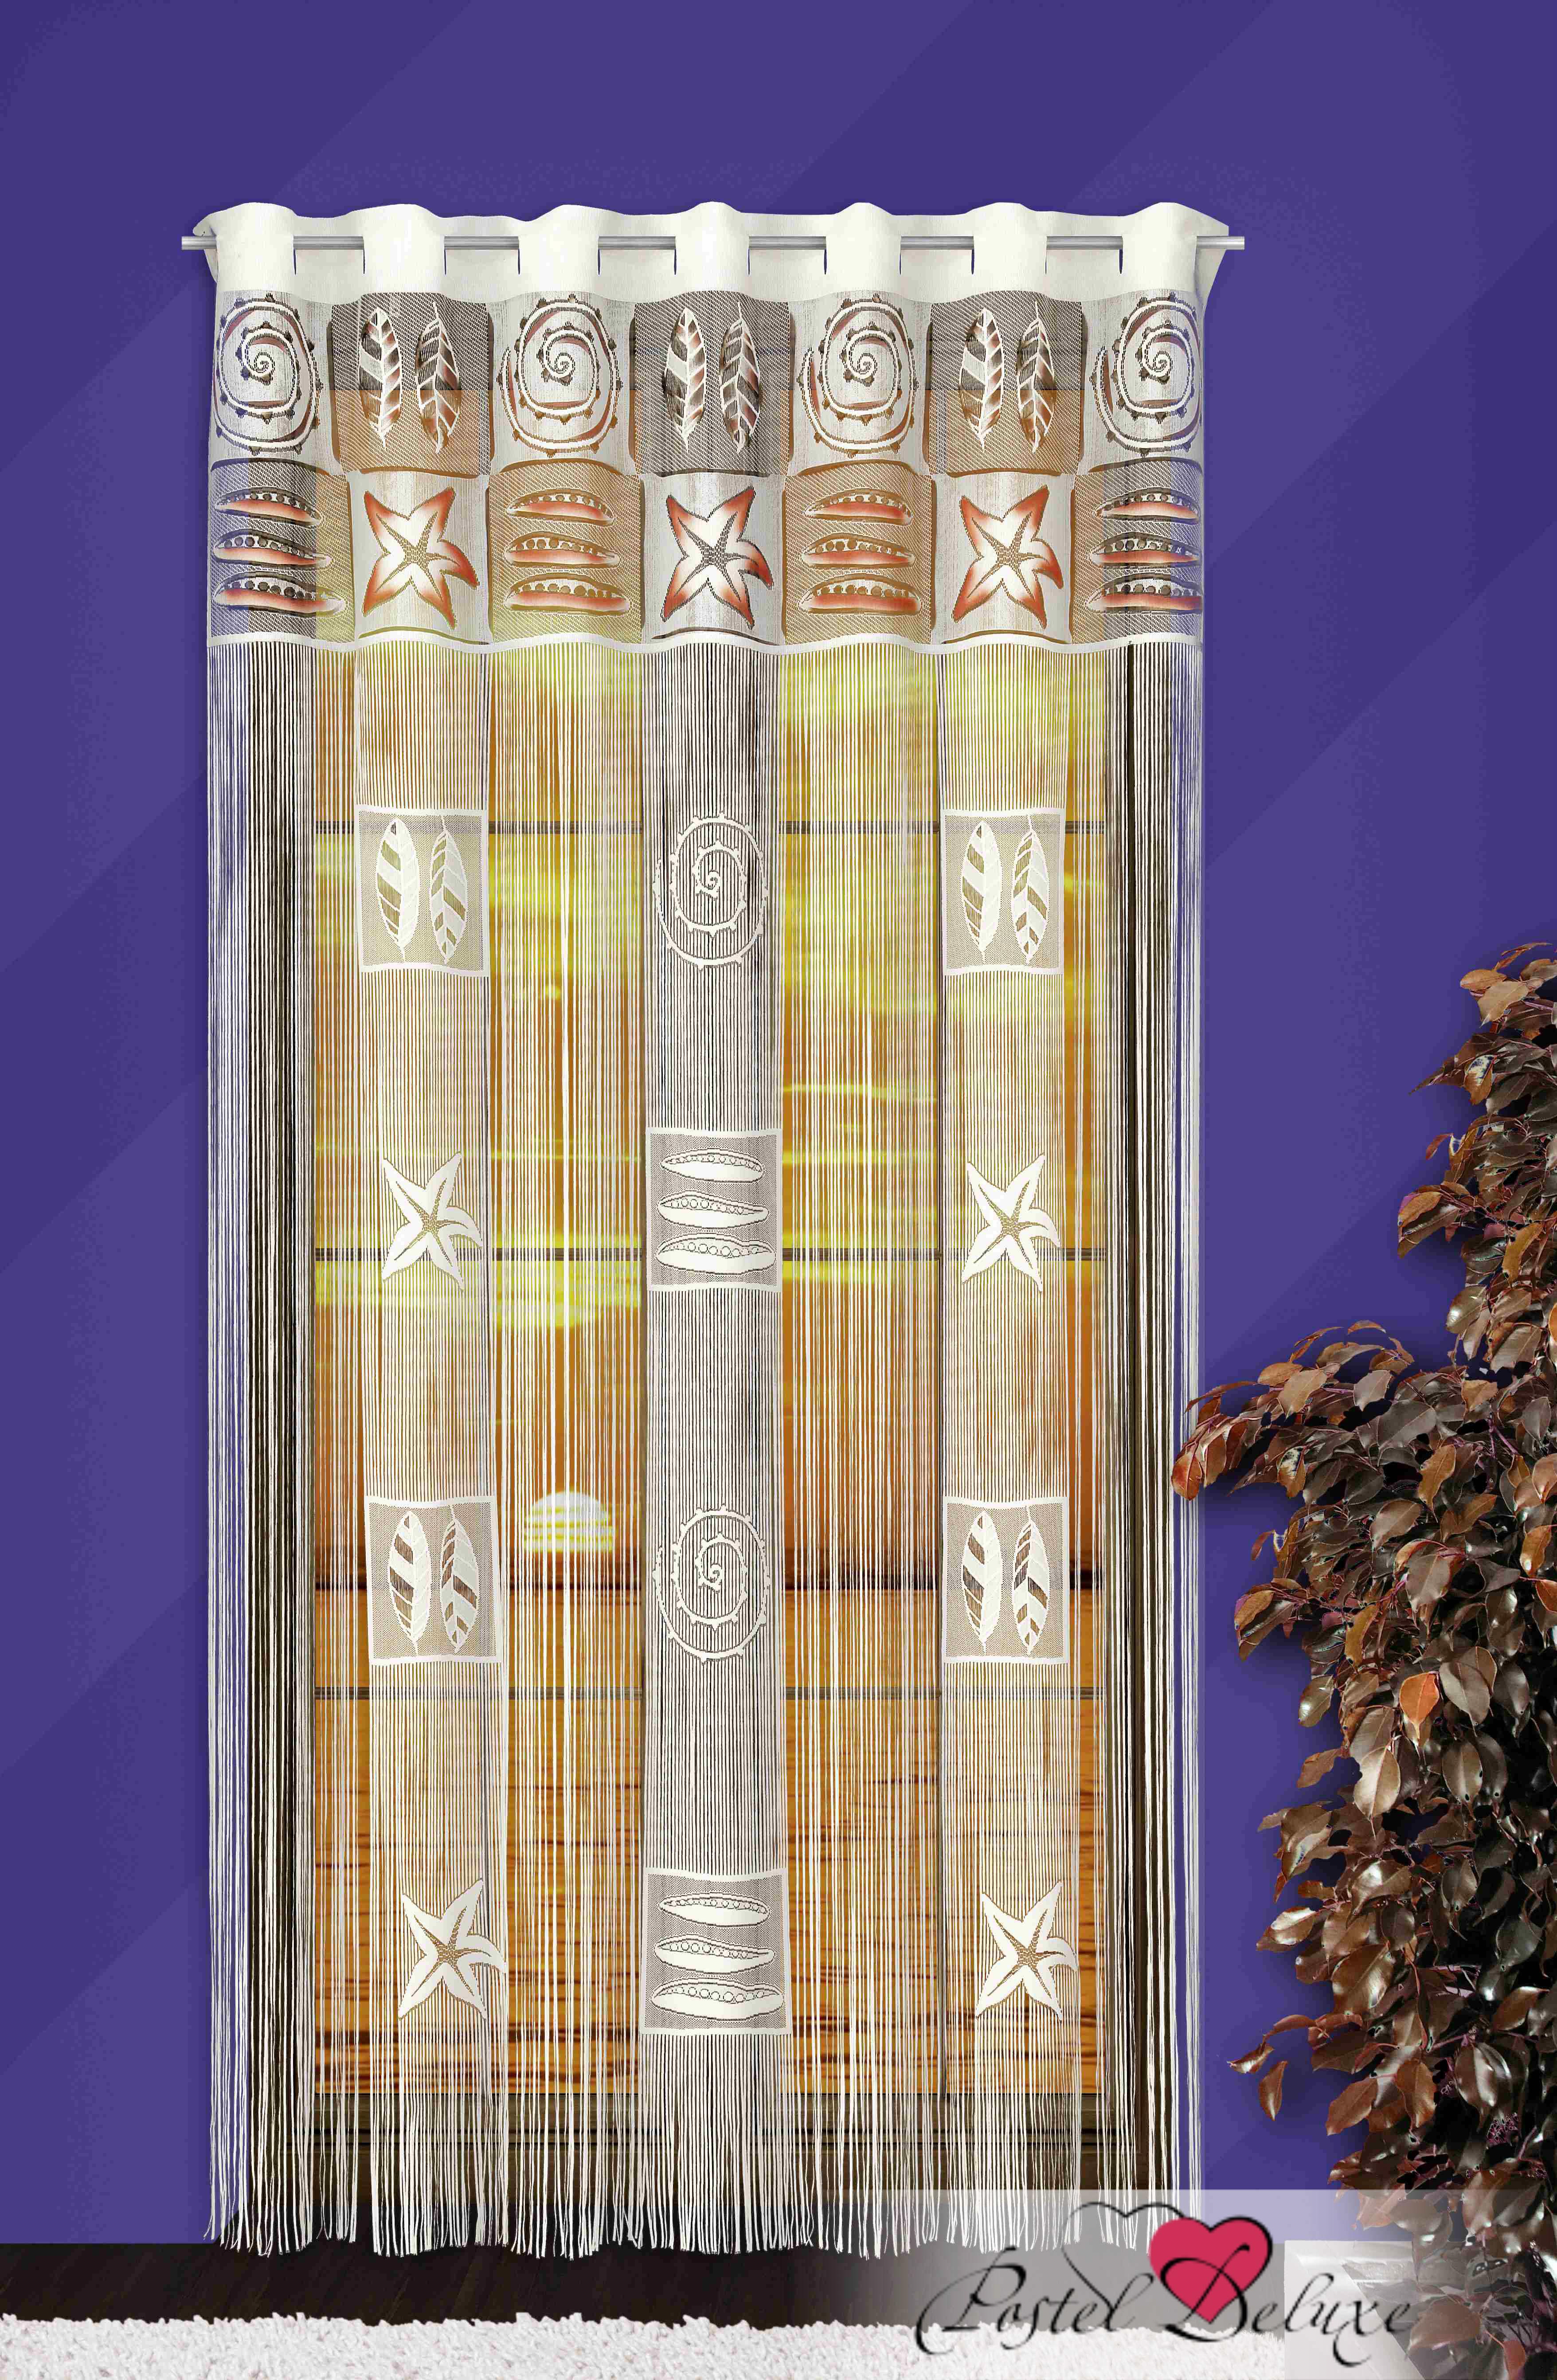 Шторы Wisan Нитяные шторы Цвет: Кремовый wisan wisan нитяные шторы joelle цвет кремовый бежевый